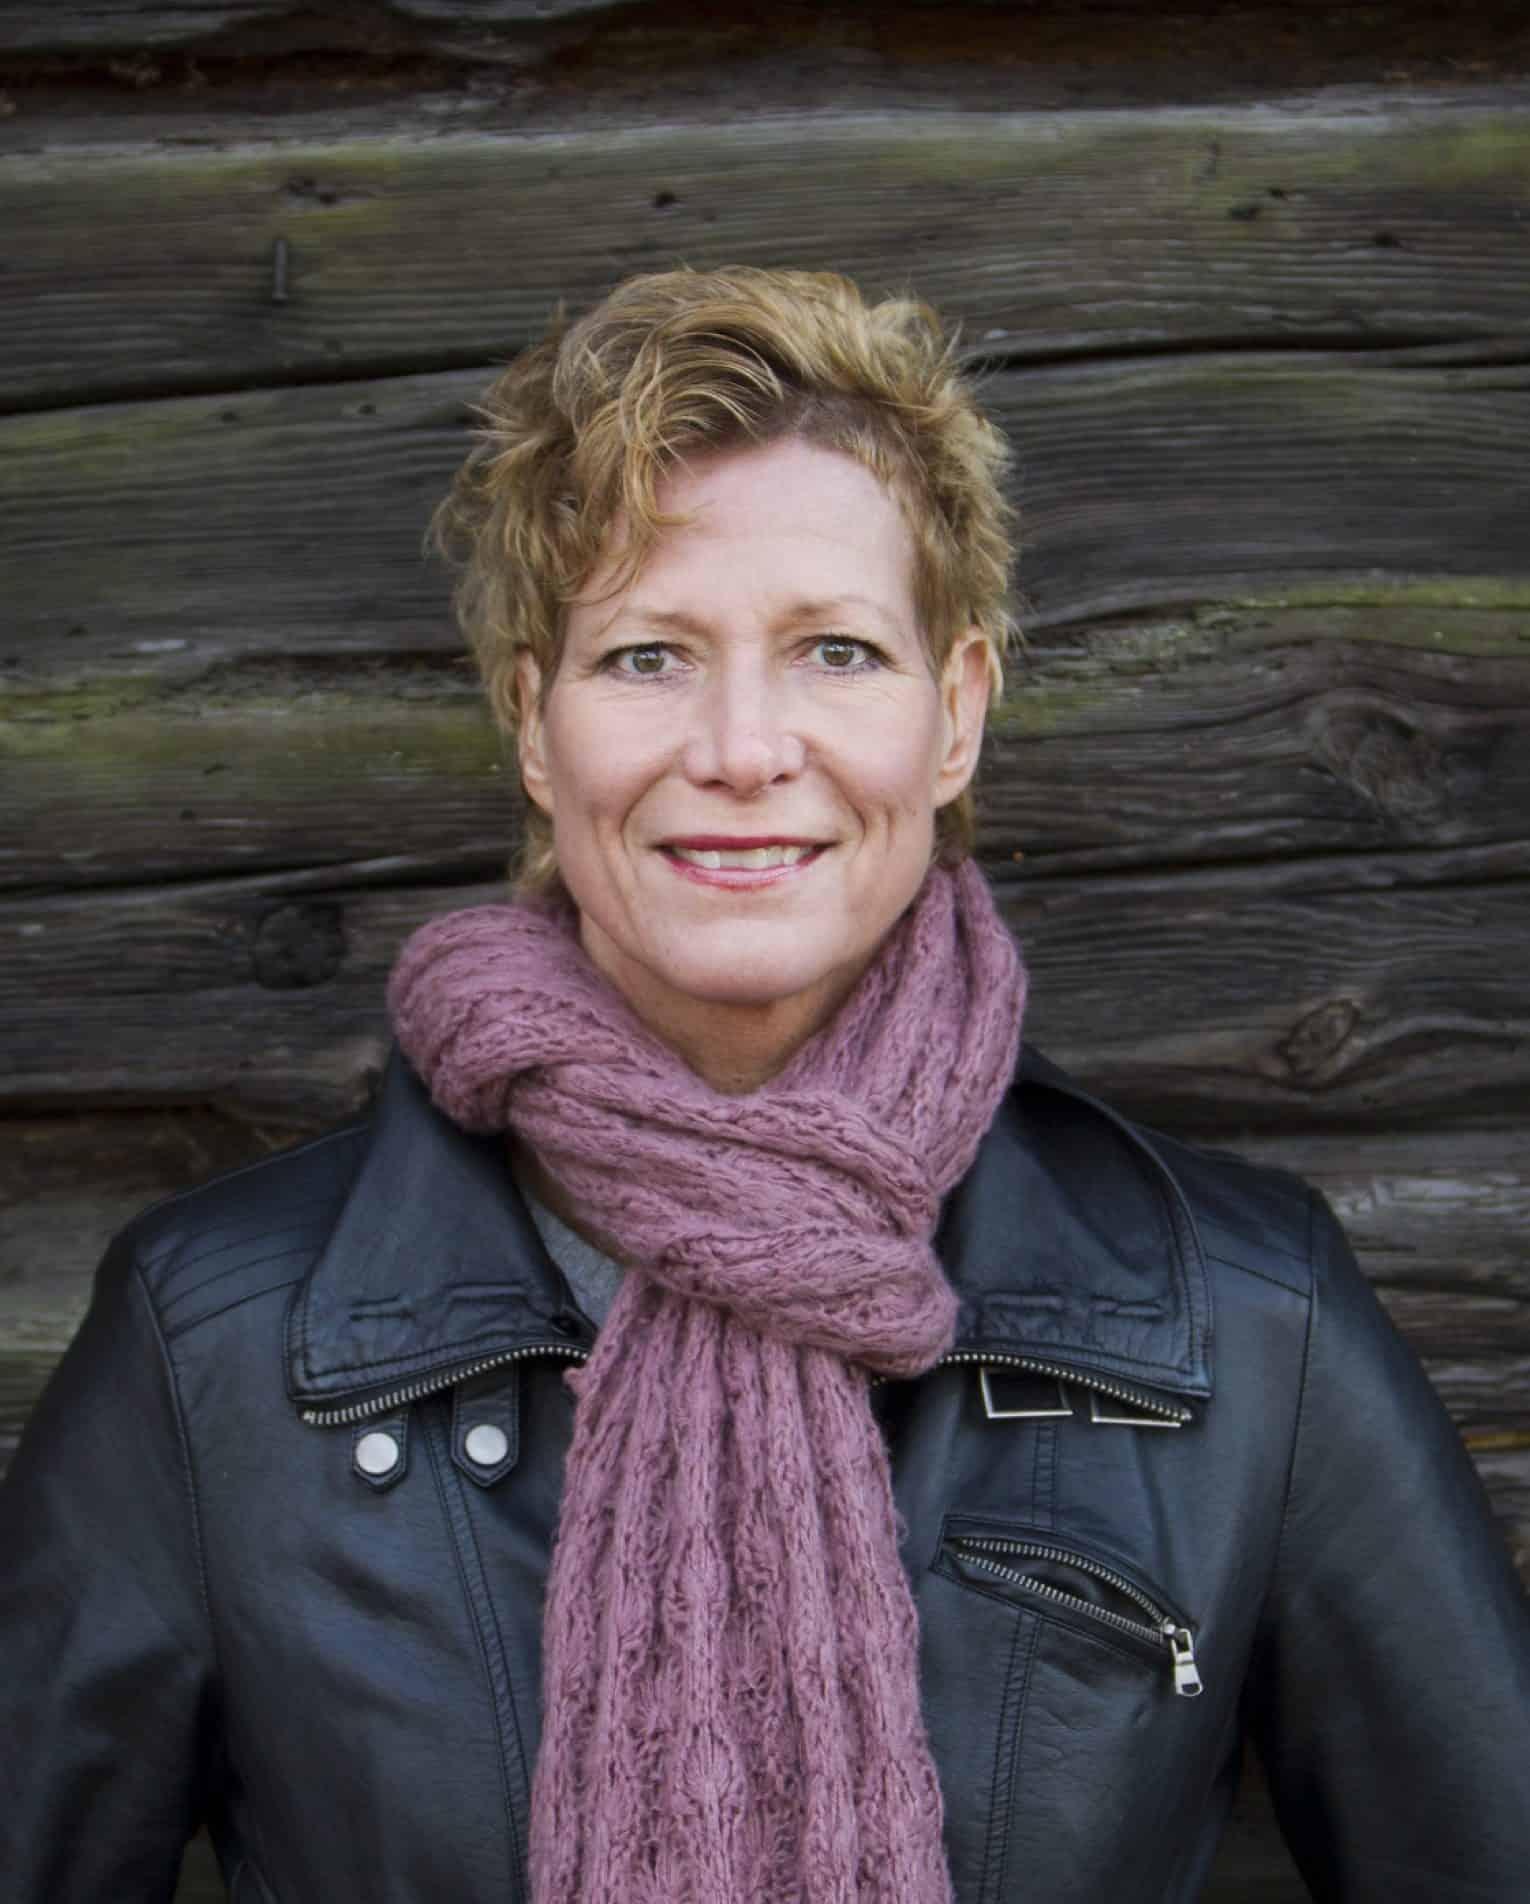 Lena Matthijs Foto: Pernilla Rudenwall Petrie